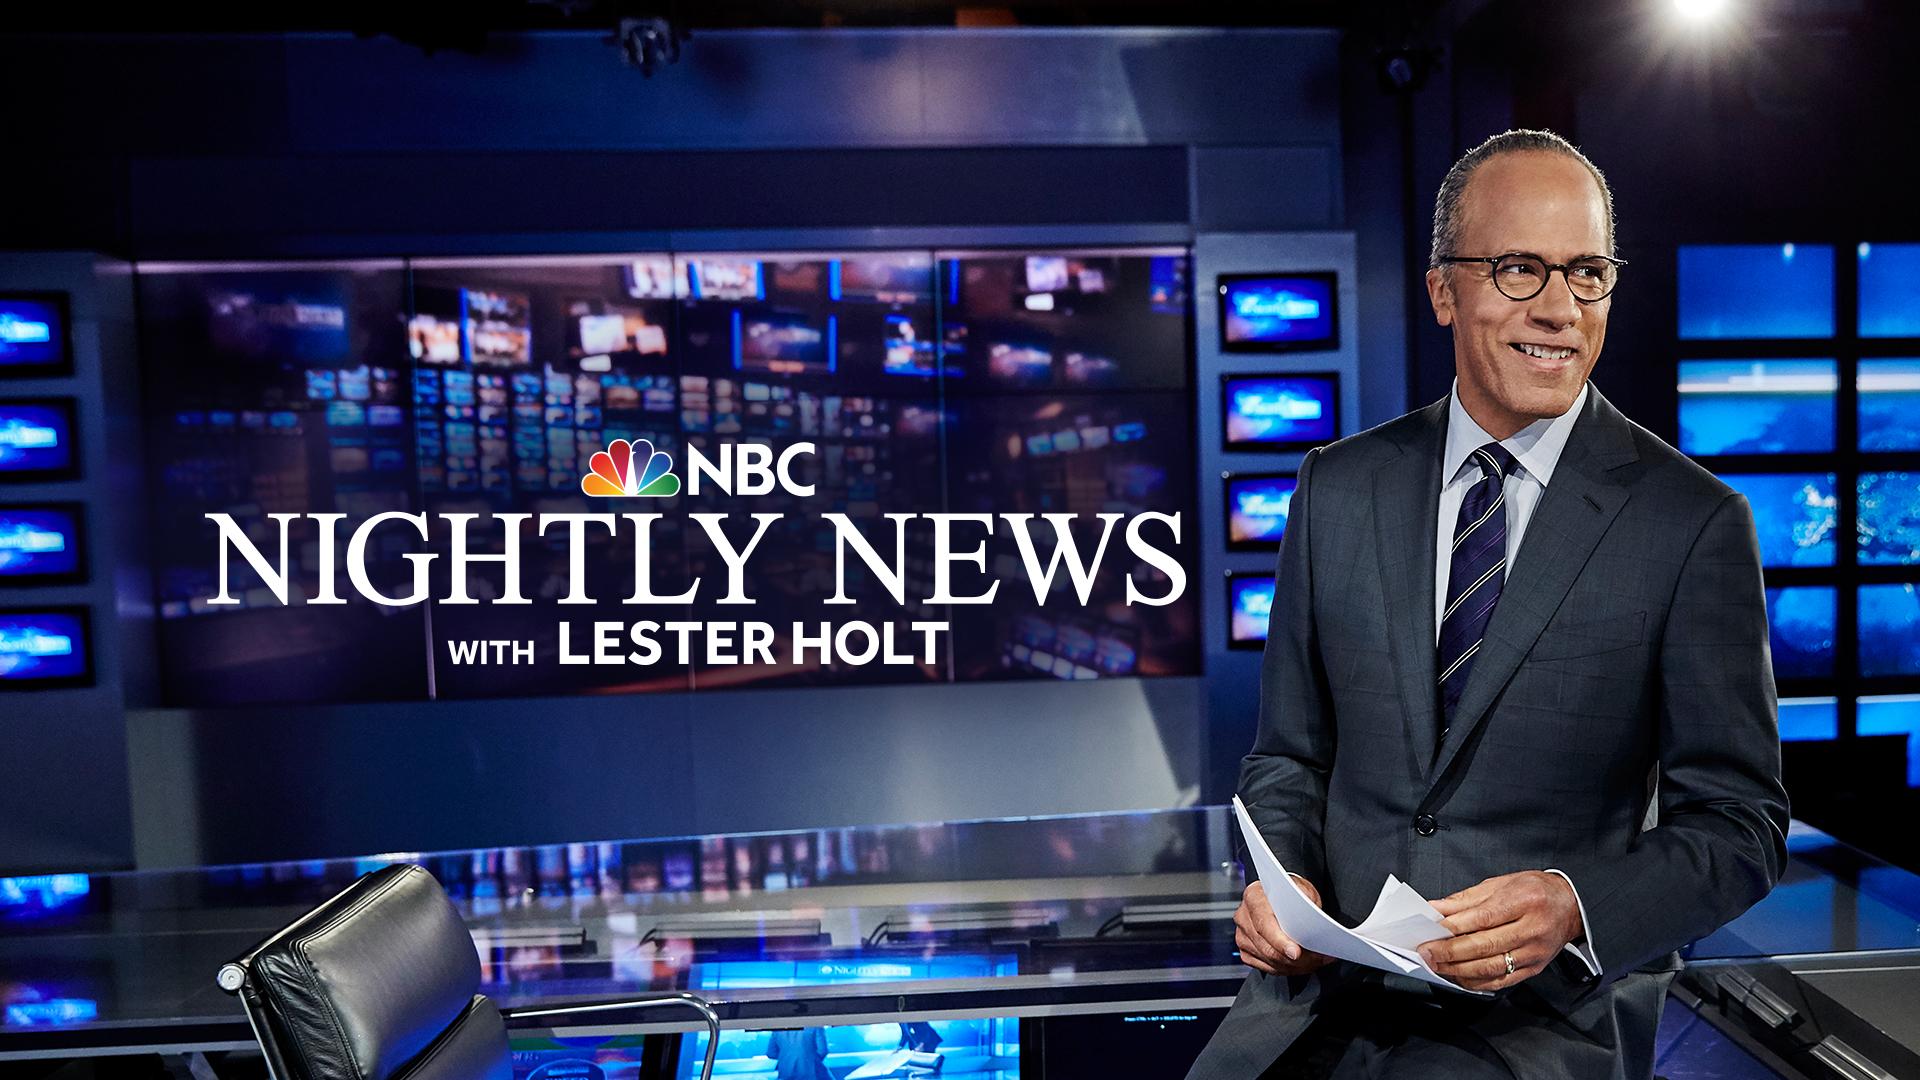 nbc news live streaming online free